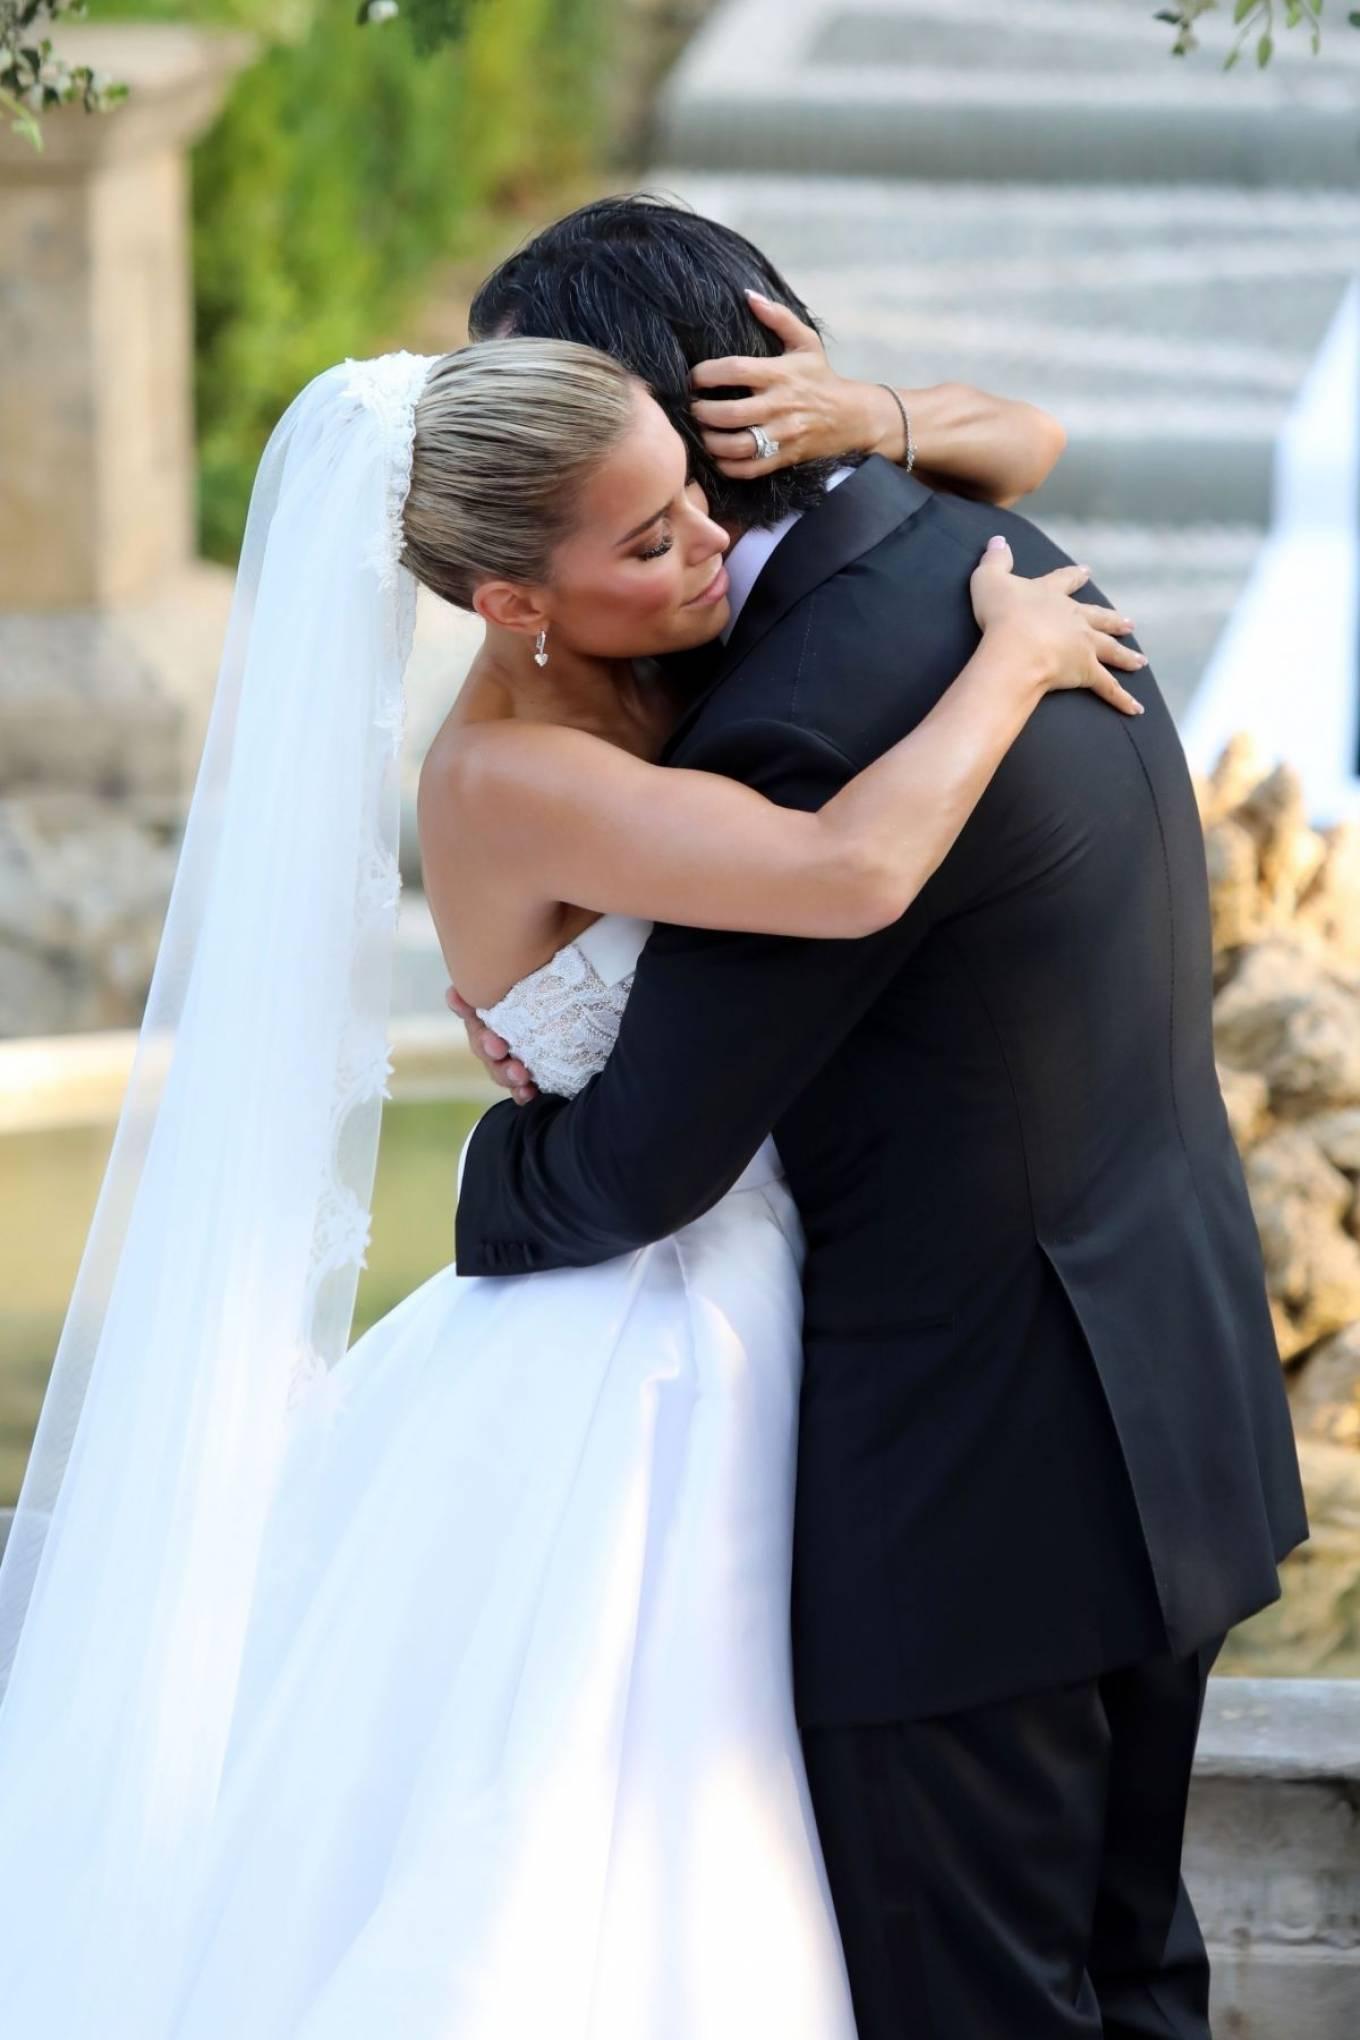 Sylvie Meis 2020 : Sylvie Meis – Wedding Ceremony in Florence-10